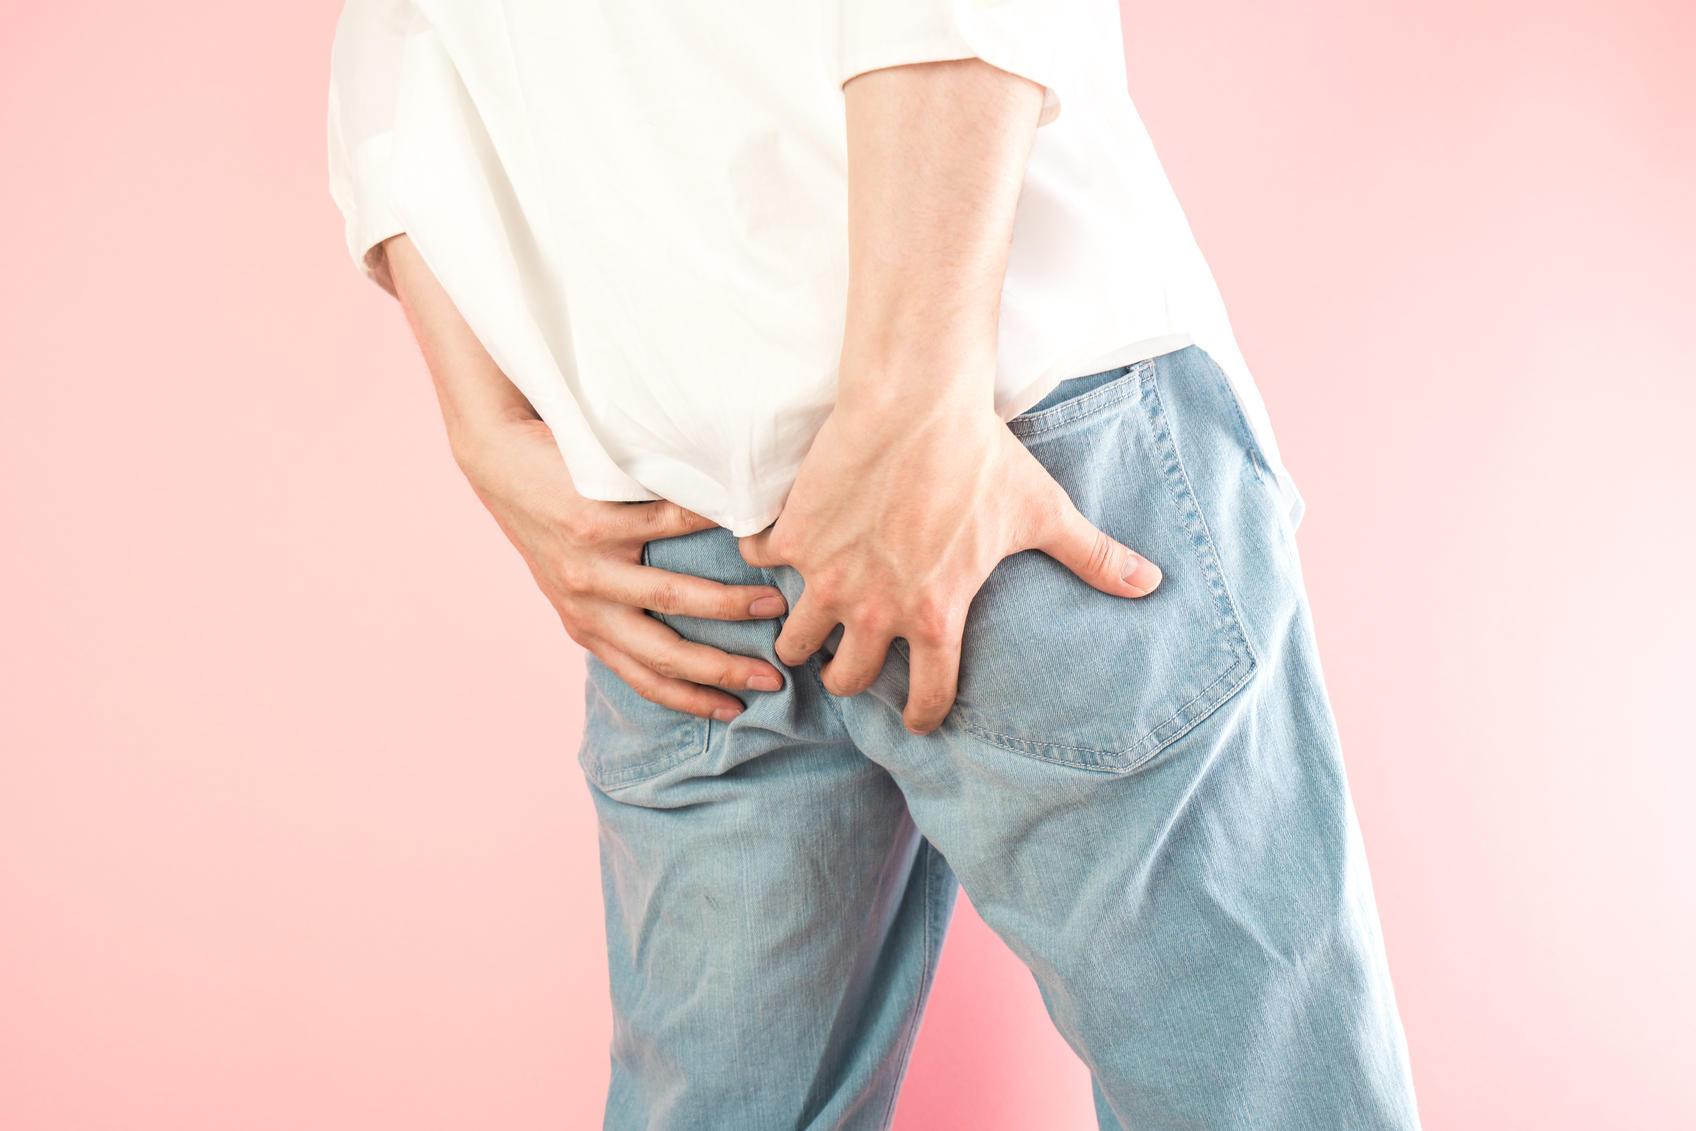 Suppositoires de glycérine de fissure anale